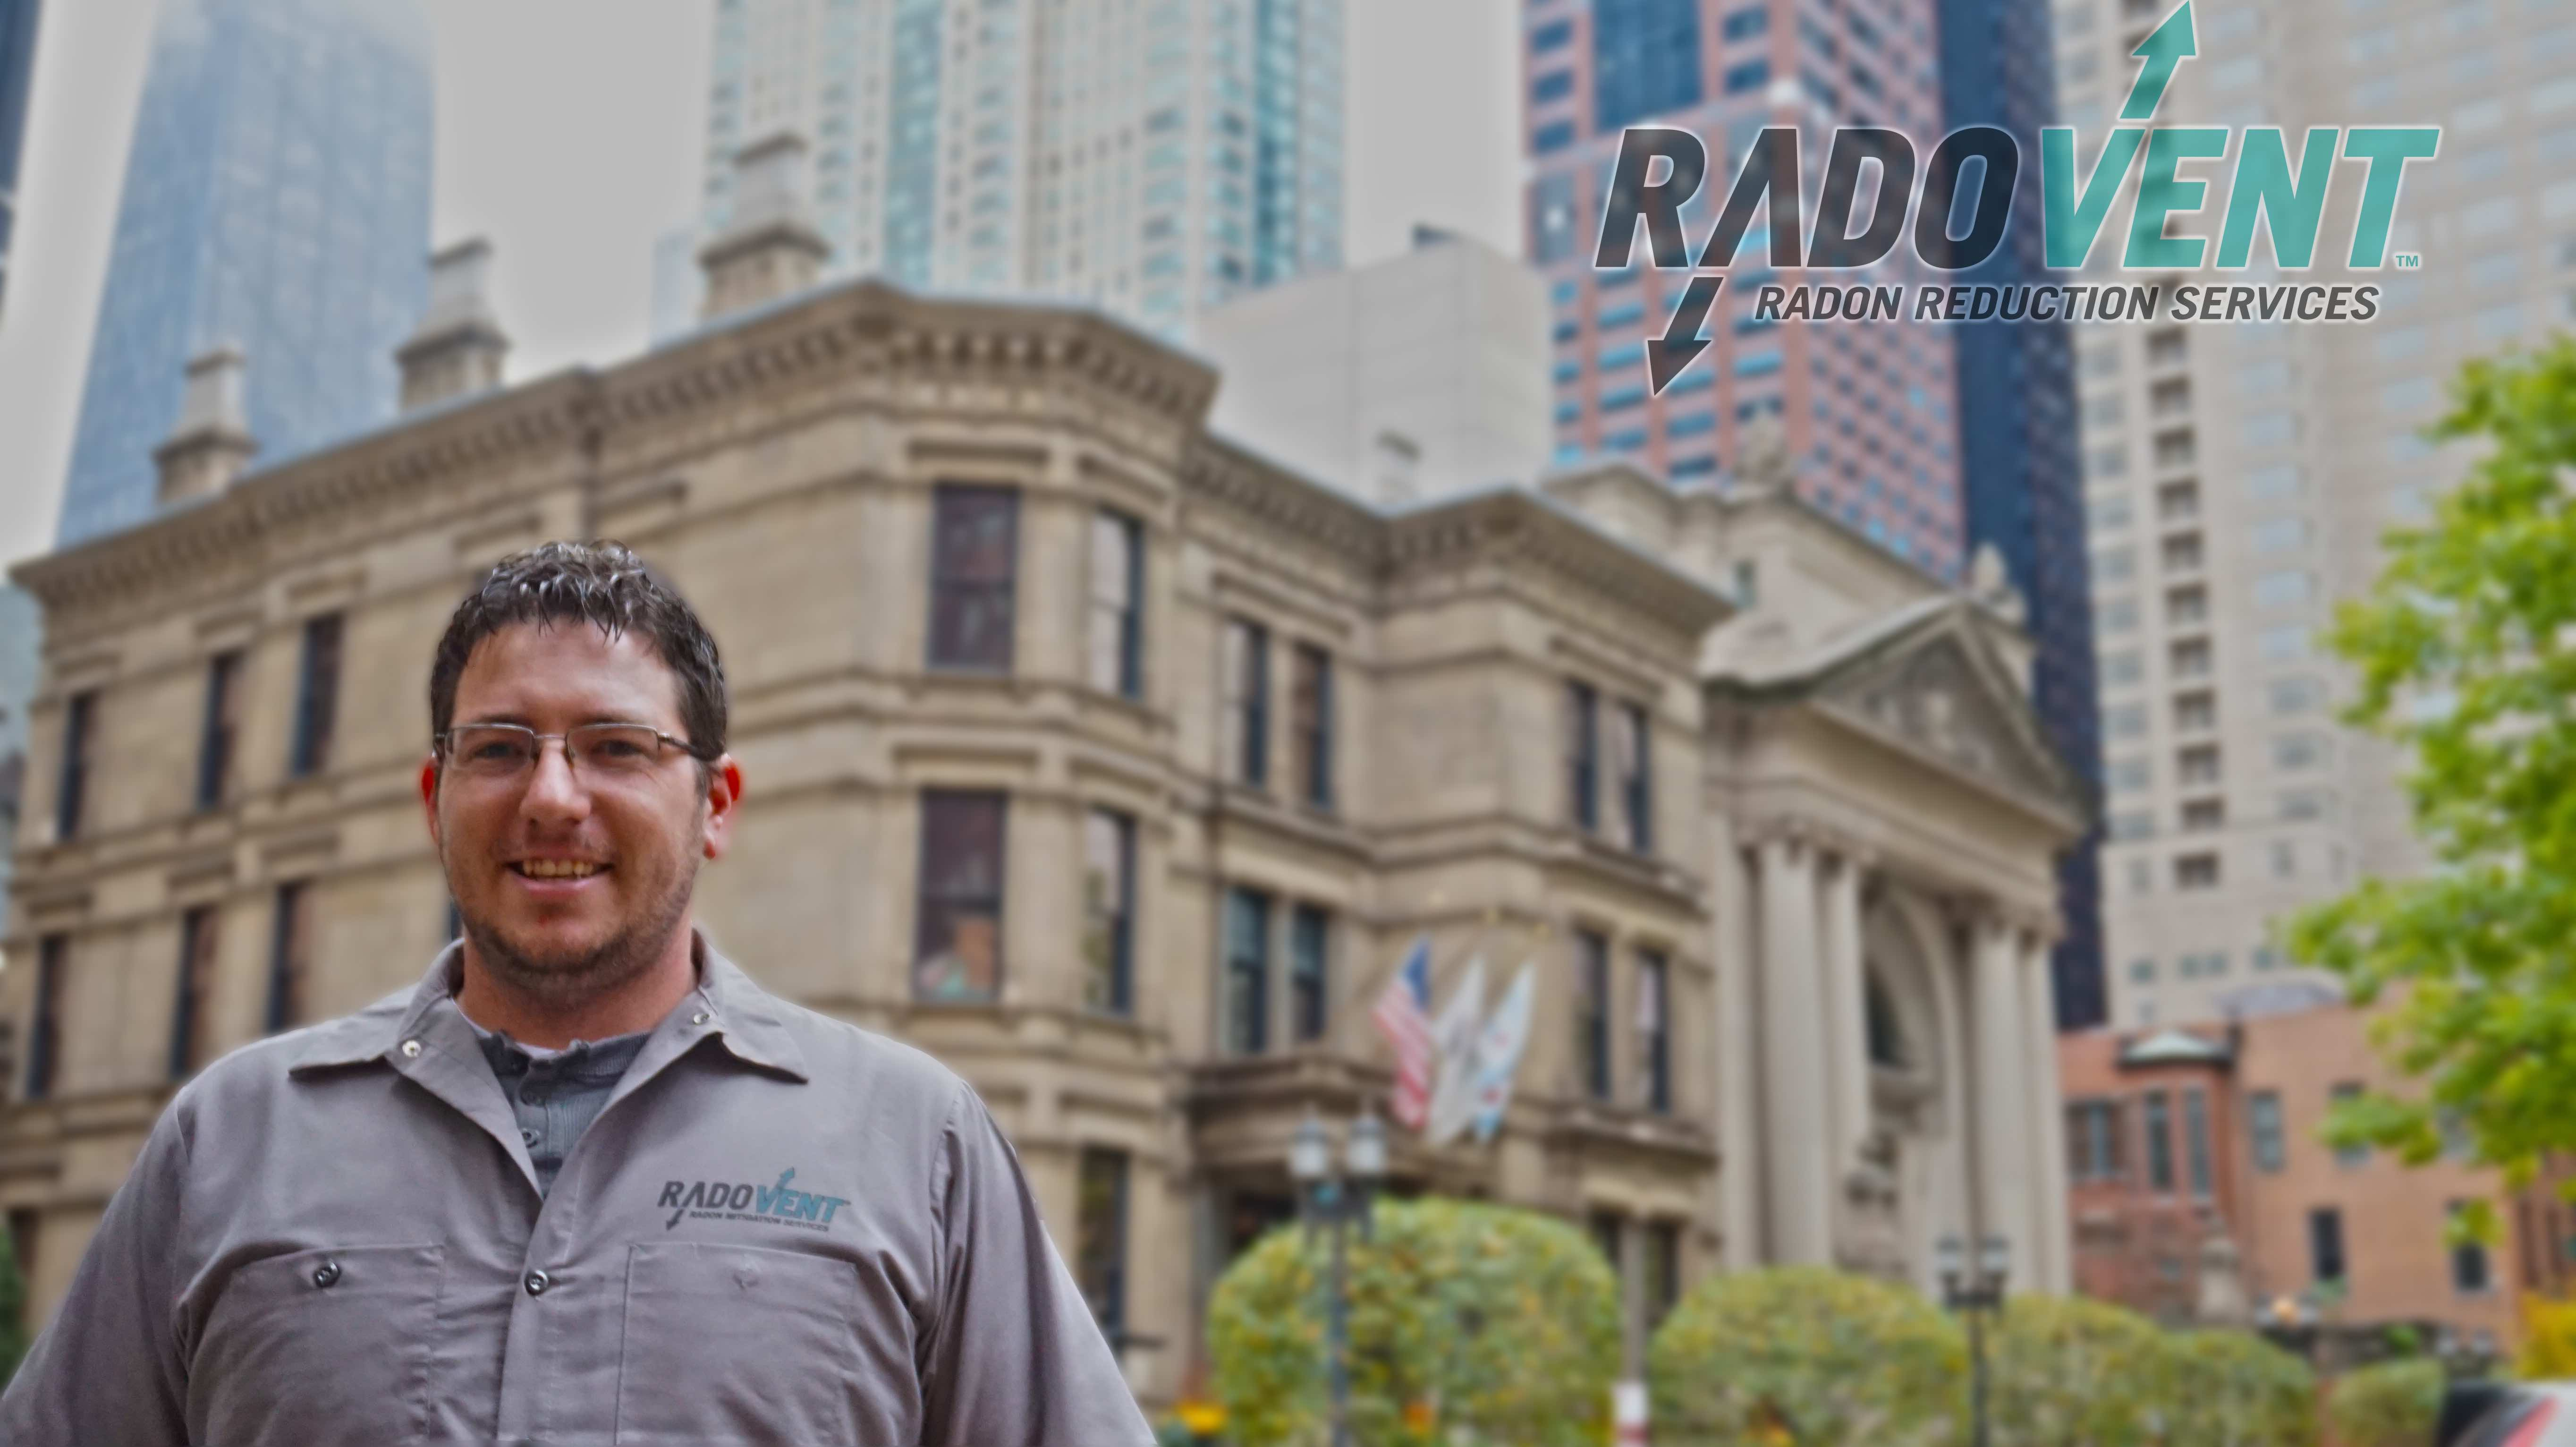 Ryan RadoVent Chicago Blur.jpg